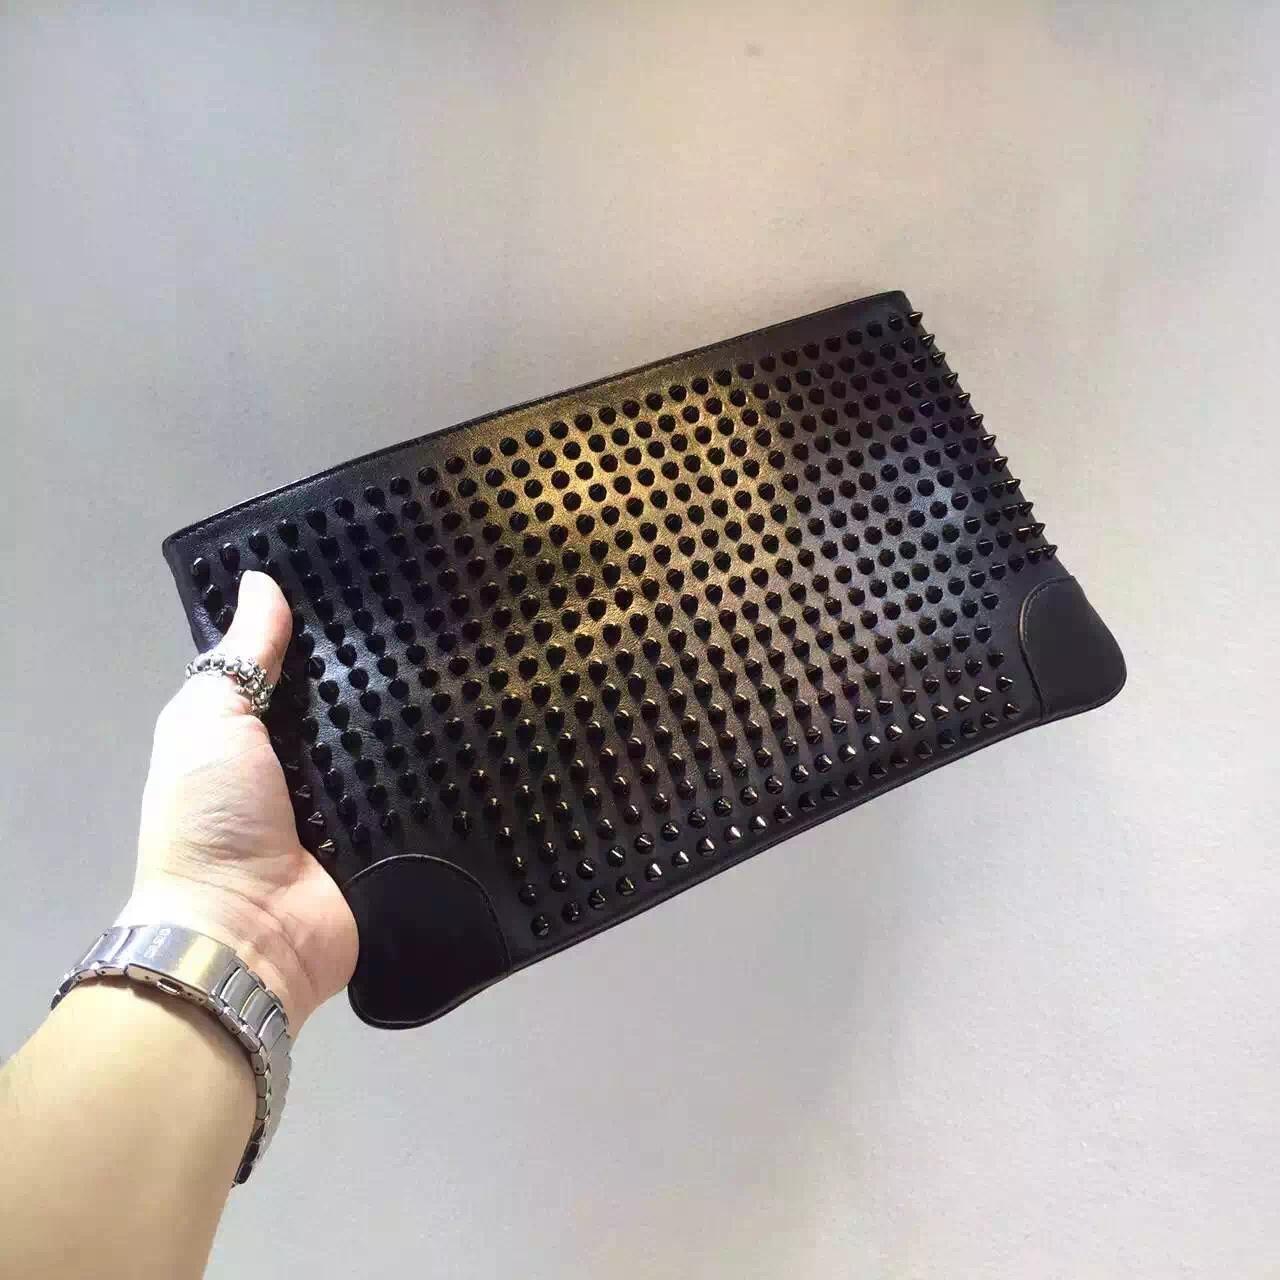 Christian Louboutin ショルダーバッグ  クラッチバッグ 2色  スーパーコピーバッグ代引き可能国内発送